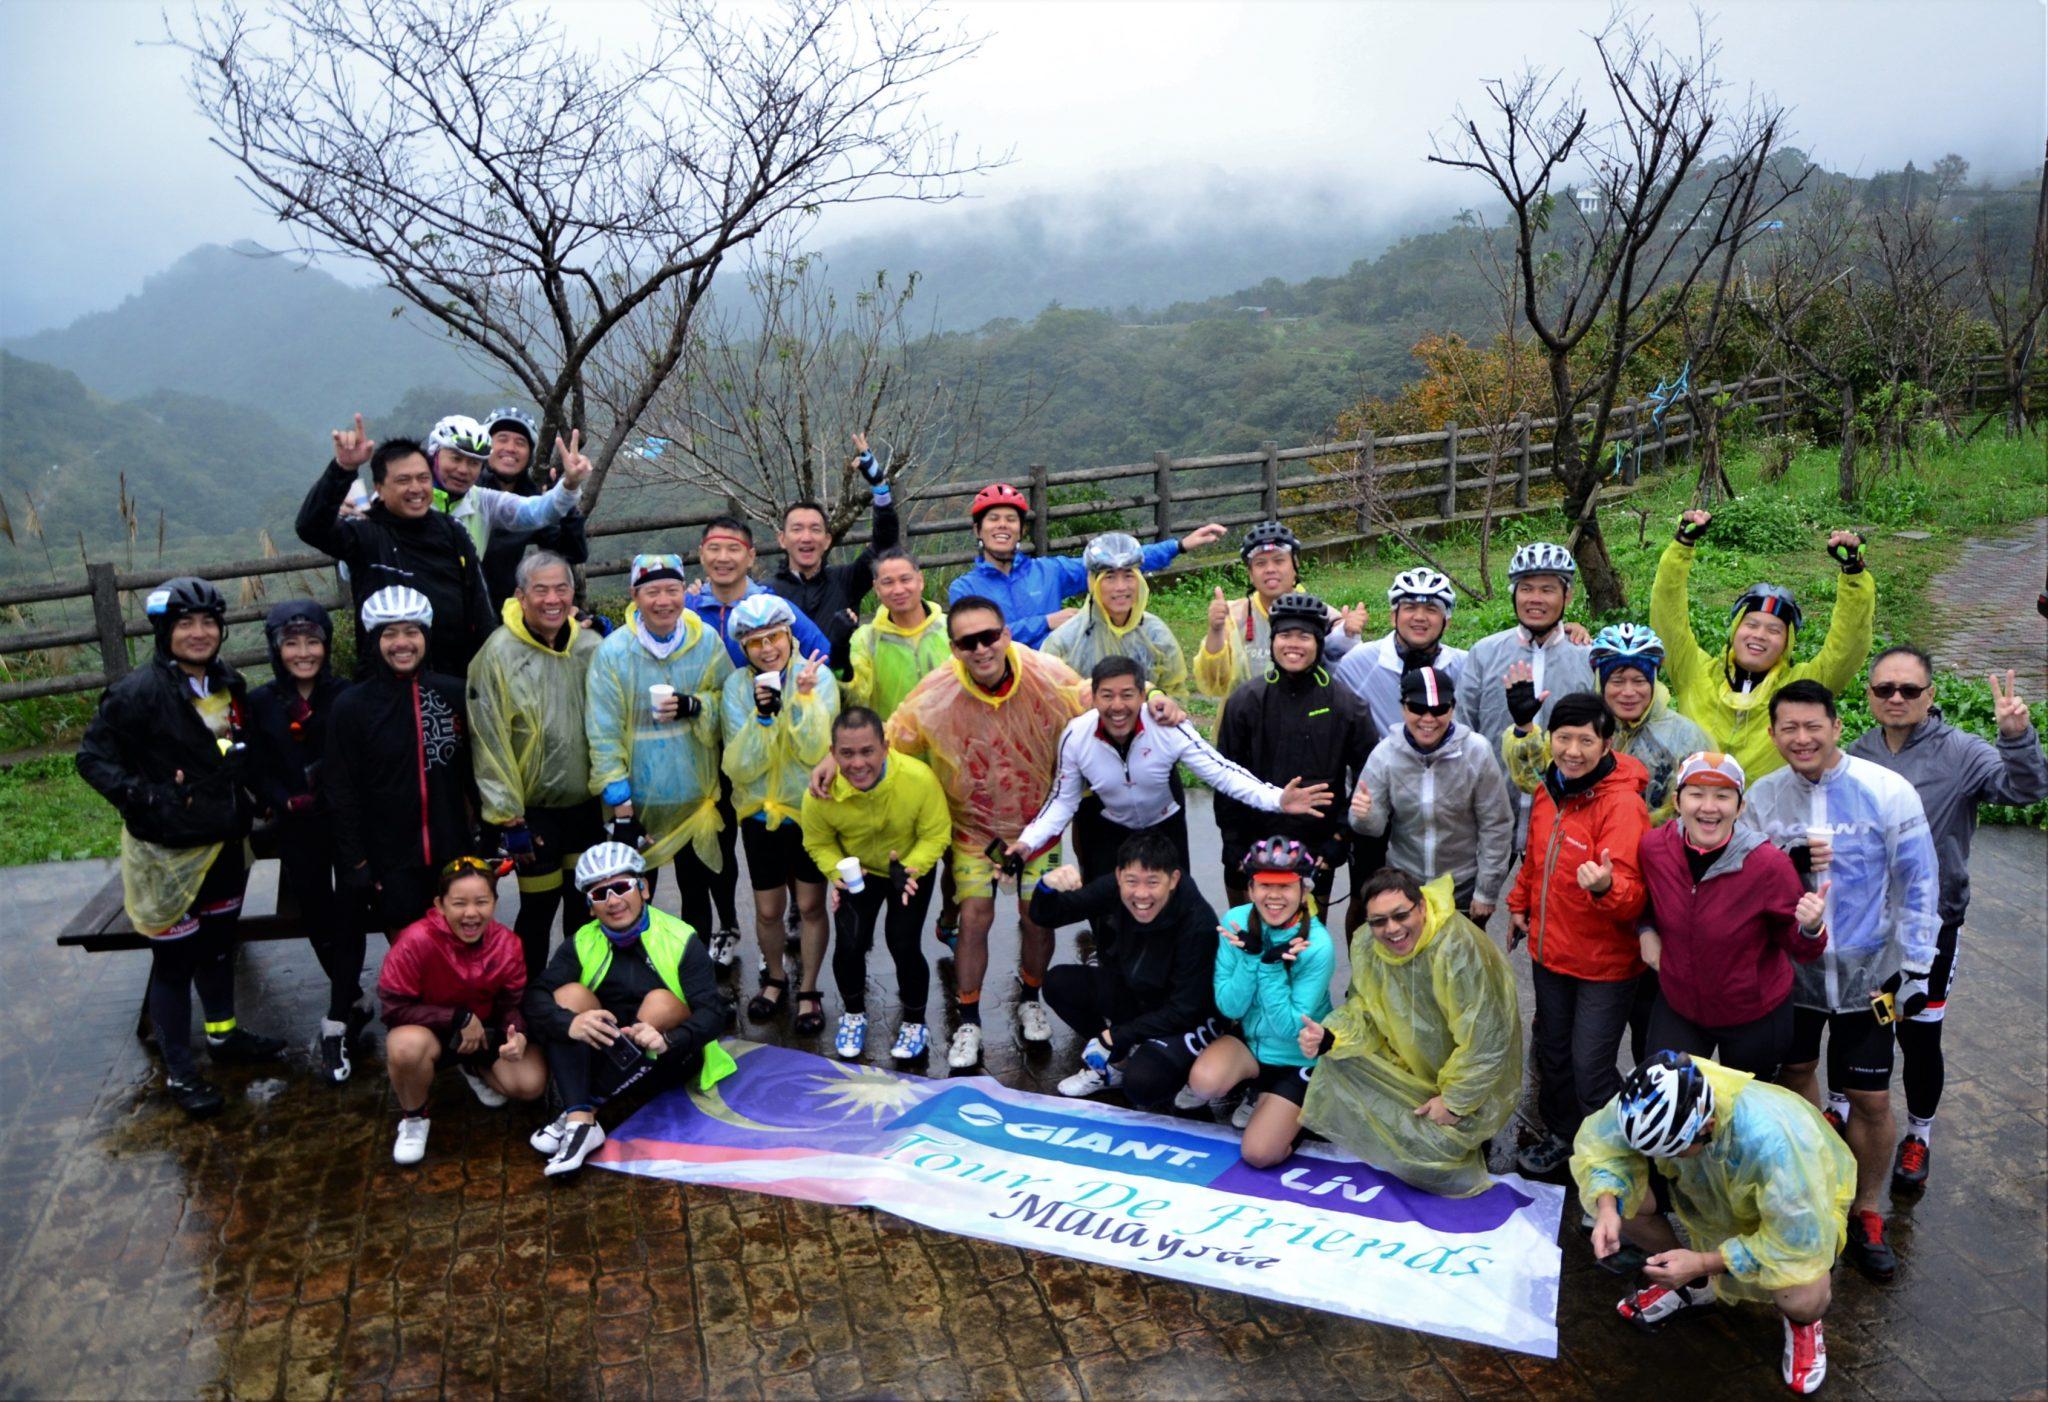 chungyung-taiwan-tour-2020-48.jpg